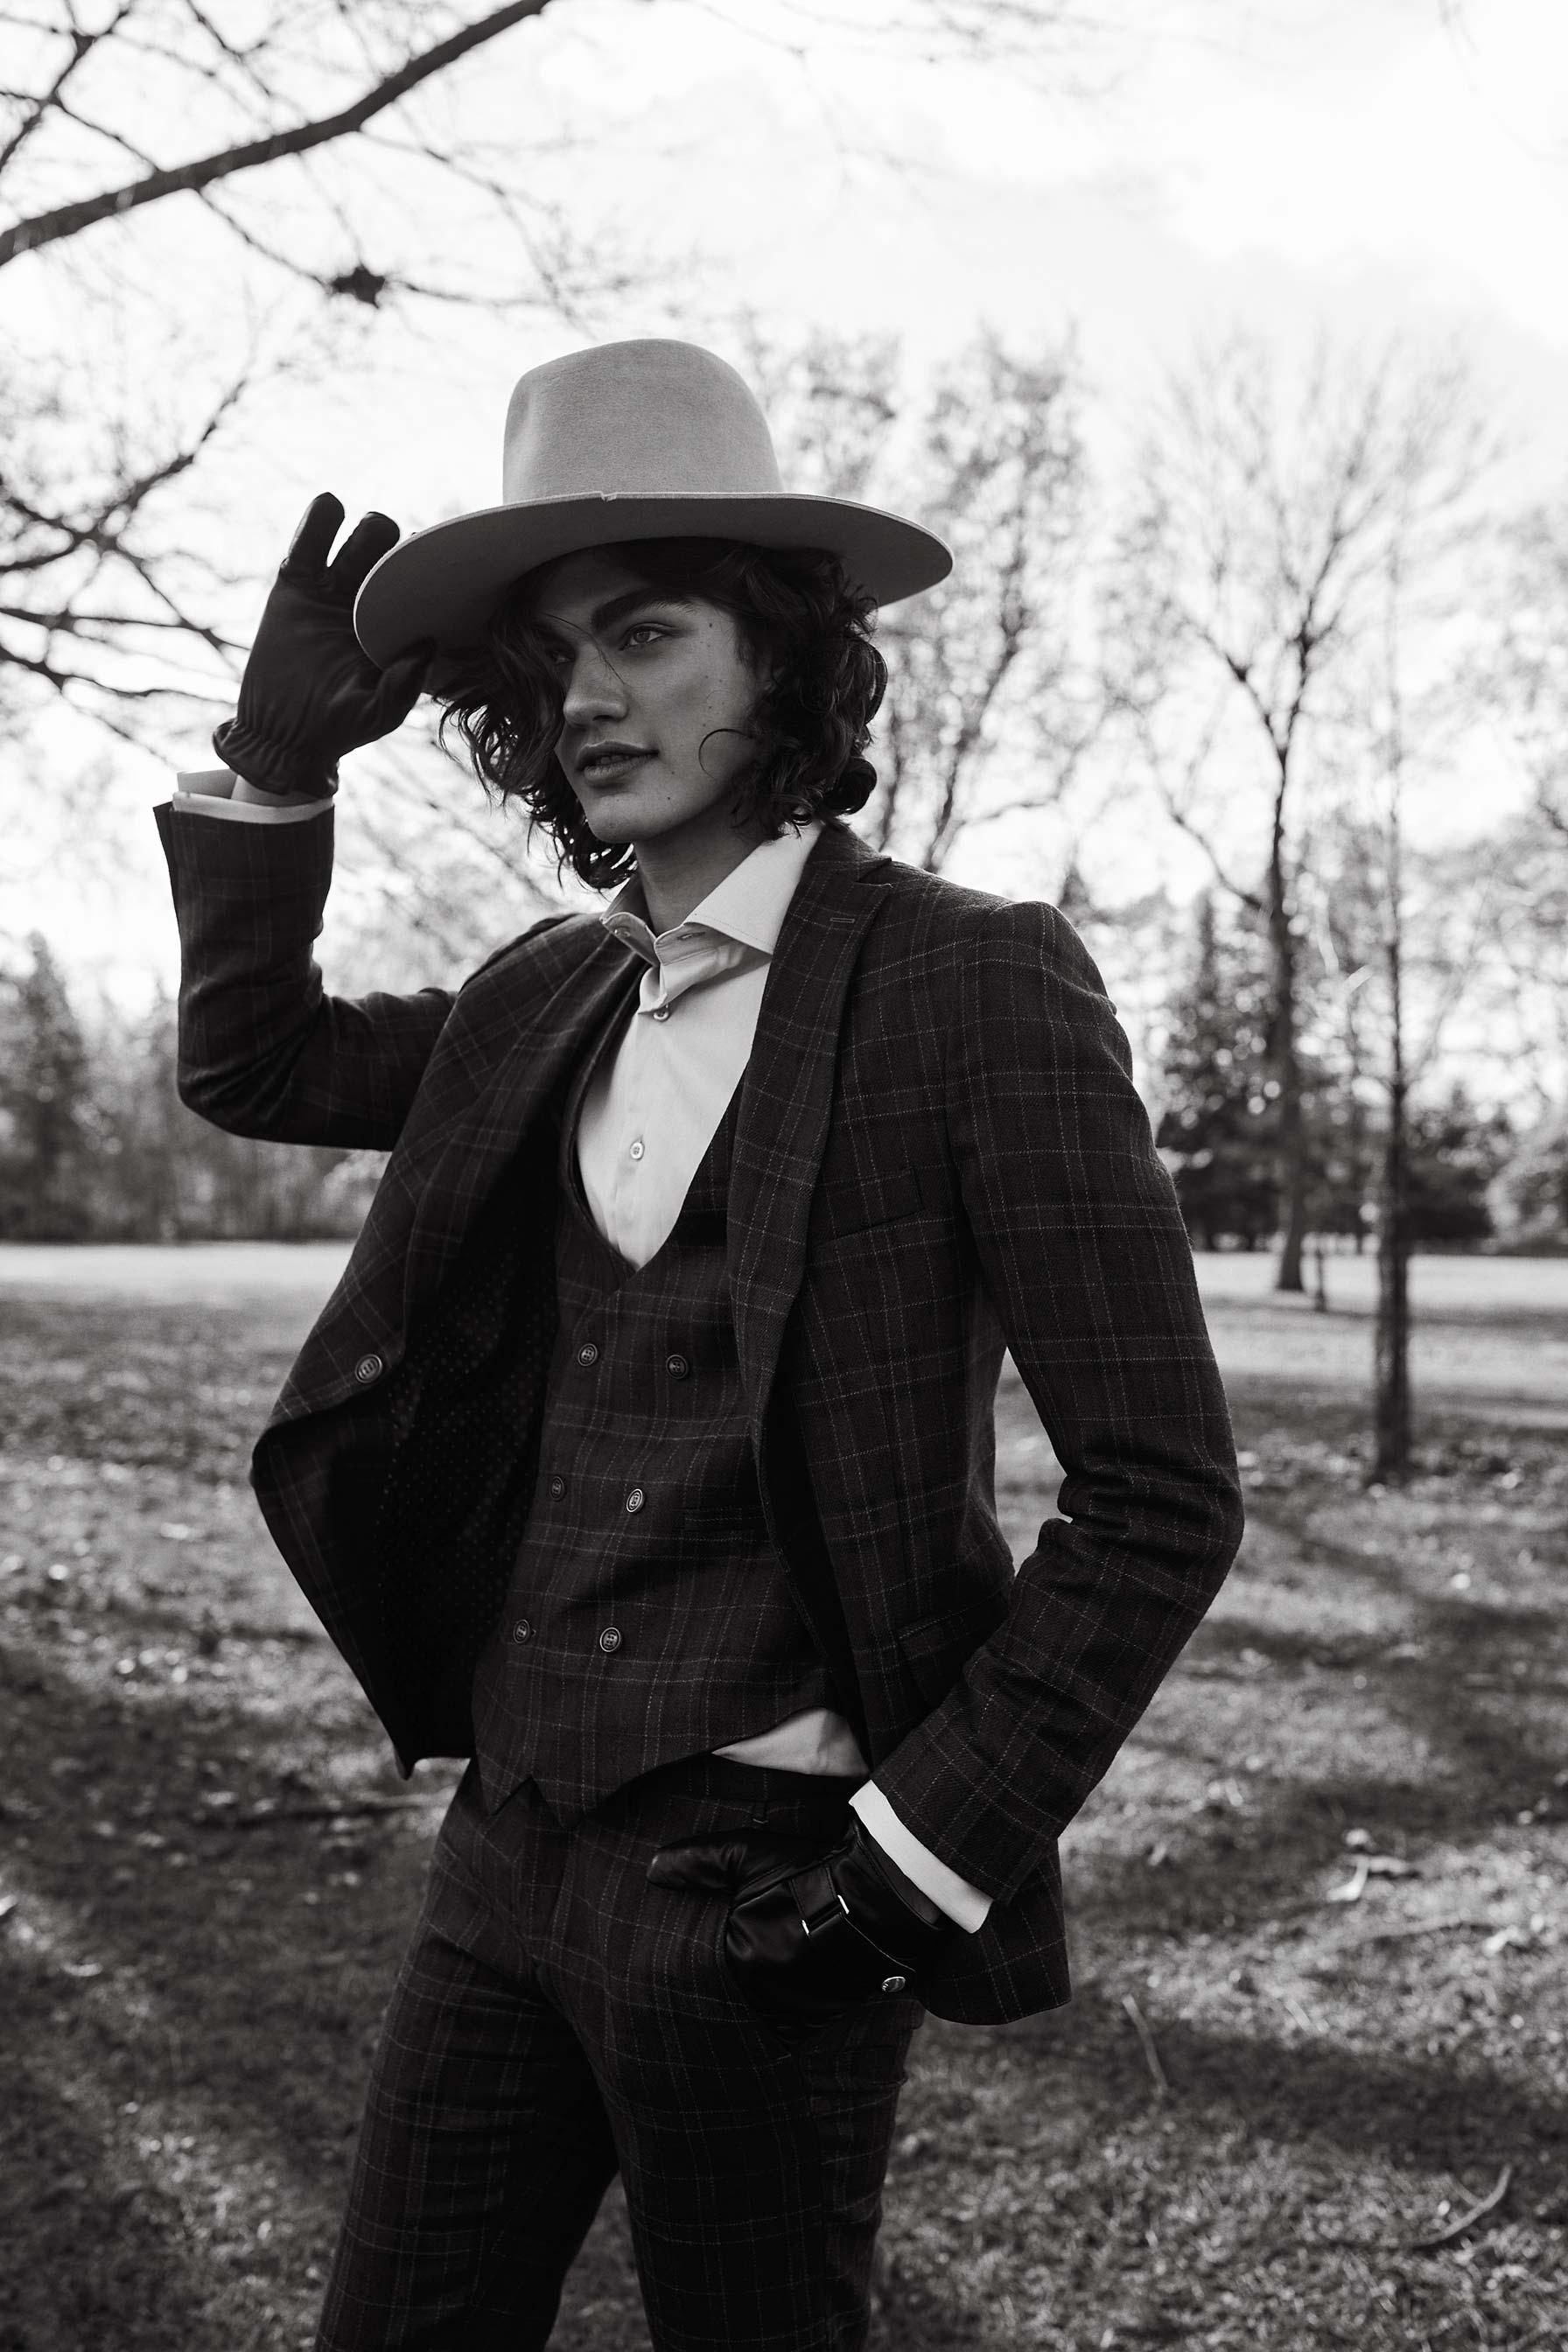 Dariane Sanche editorial photoshoot in the Montreal park Maison Neuve.